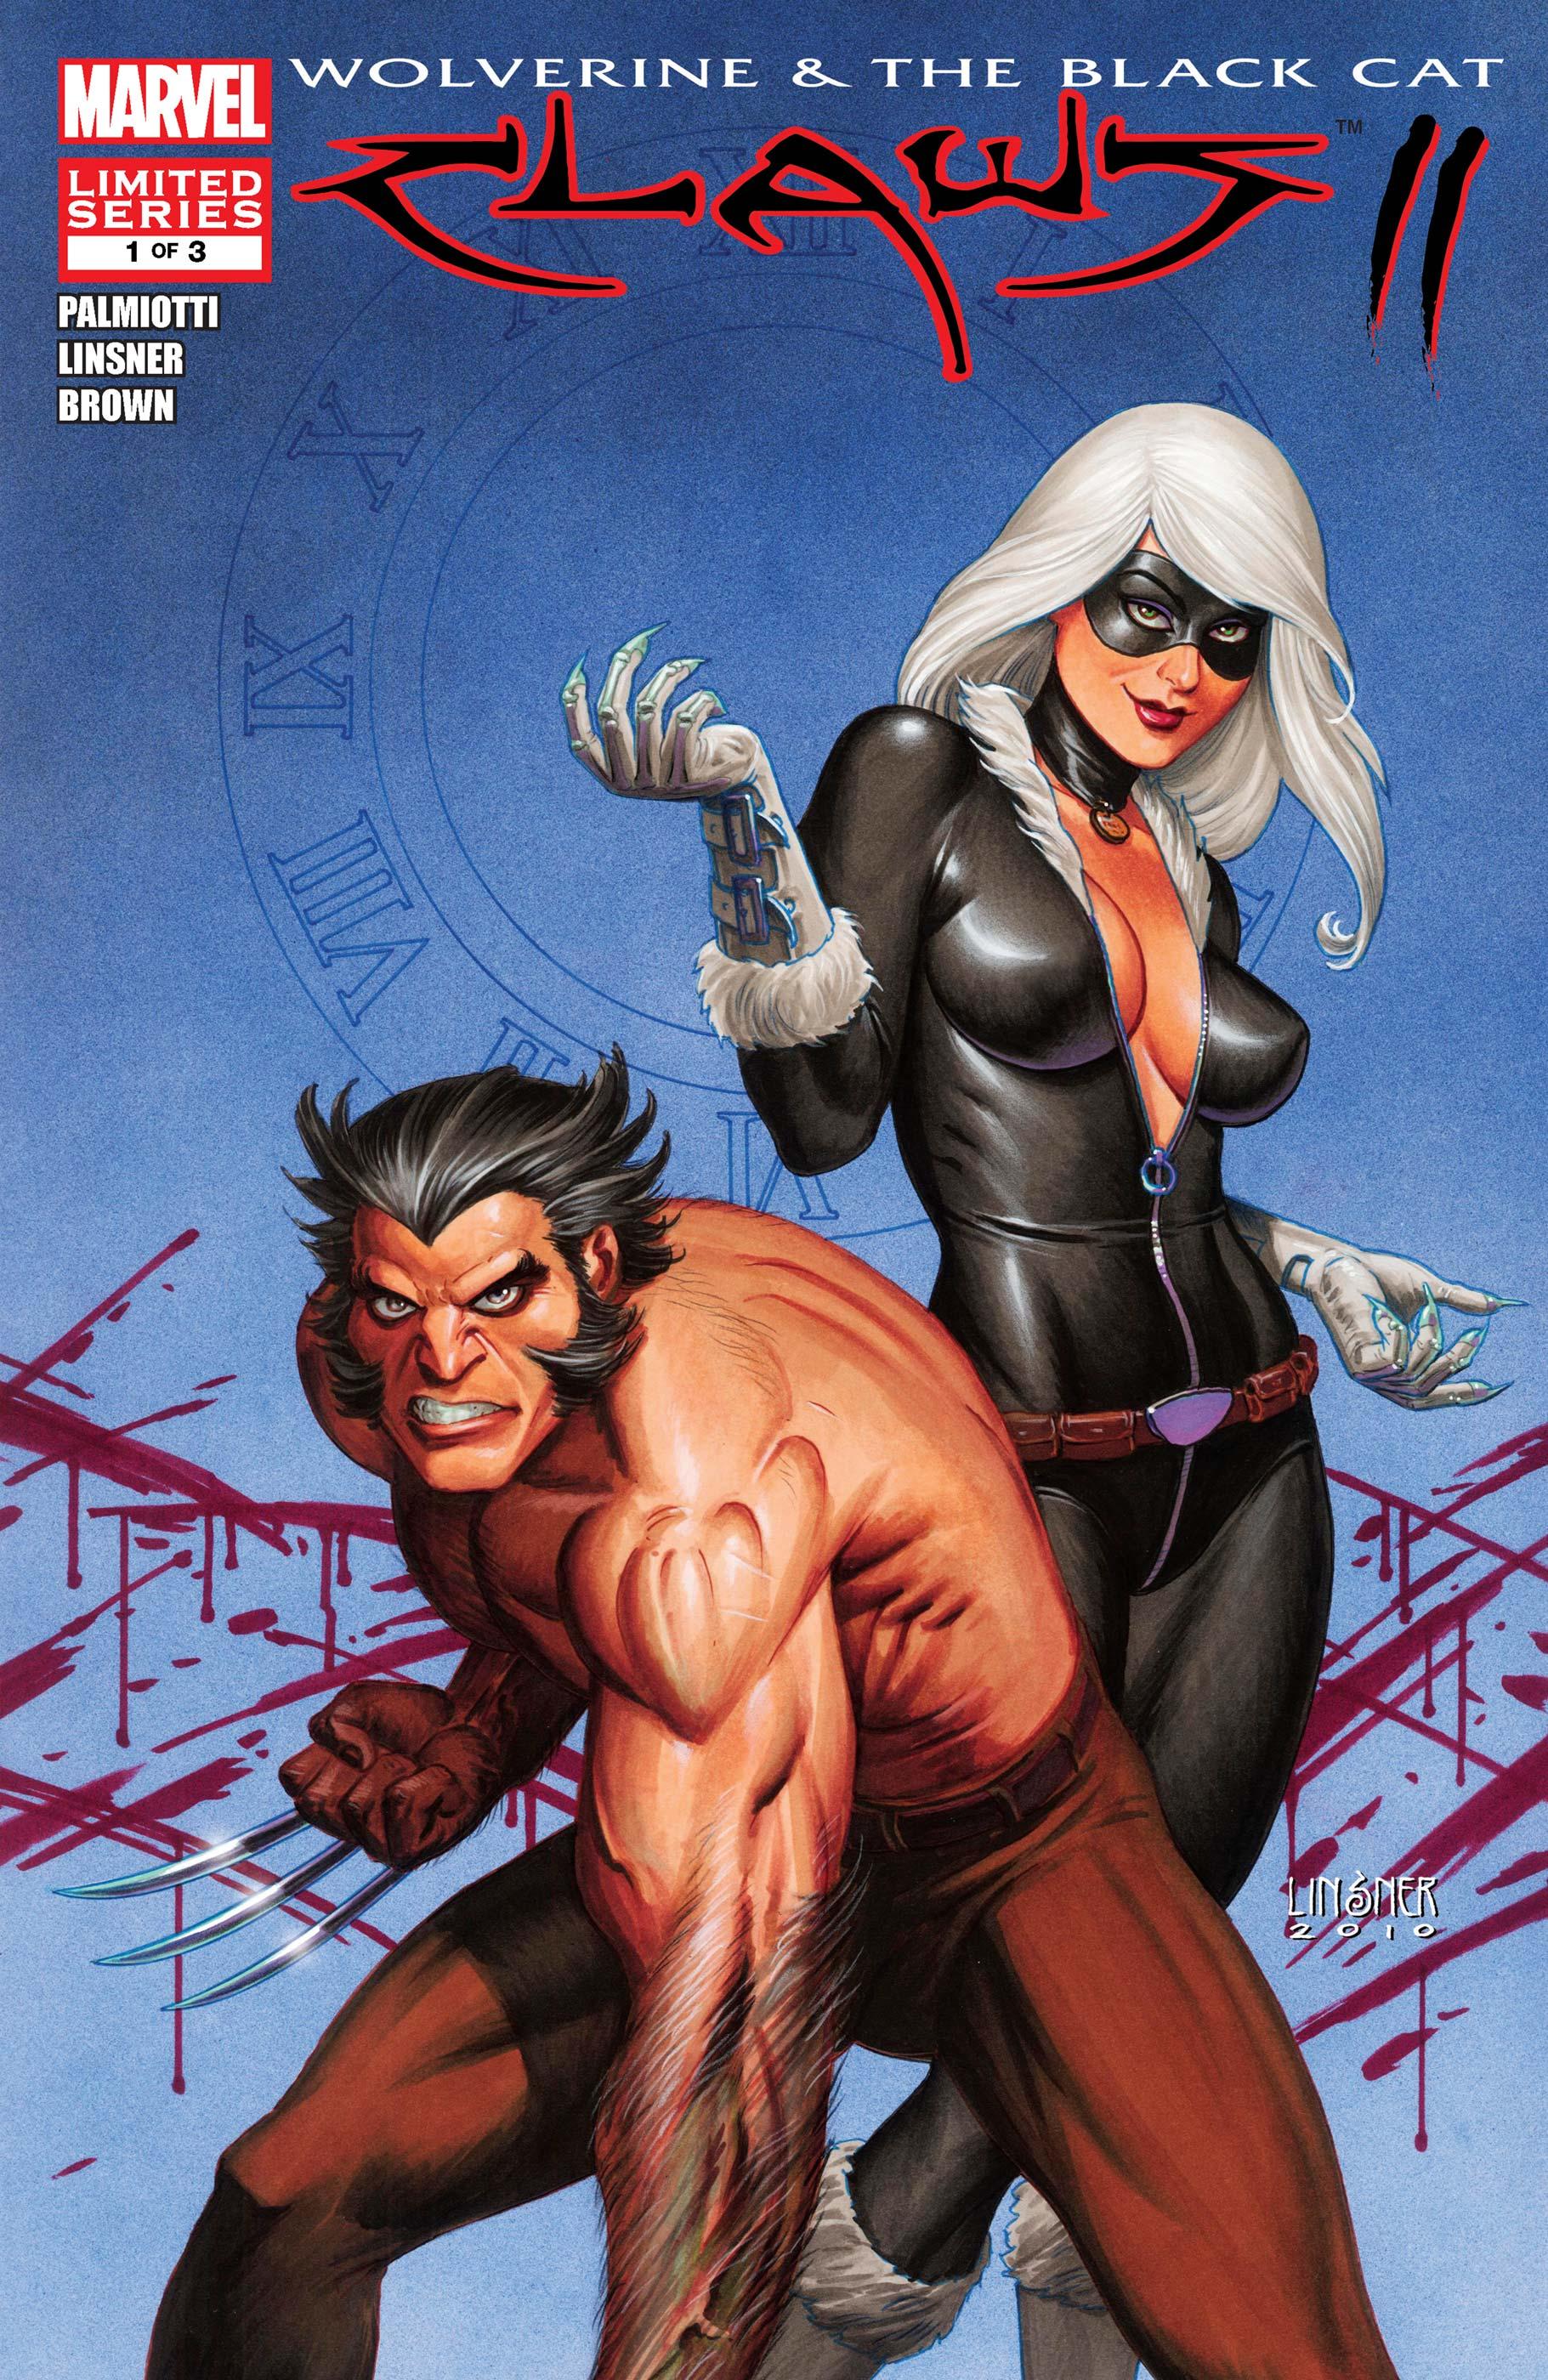 Wolverine & Black Cat: Claws 2 (2010) #1